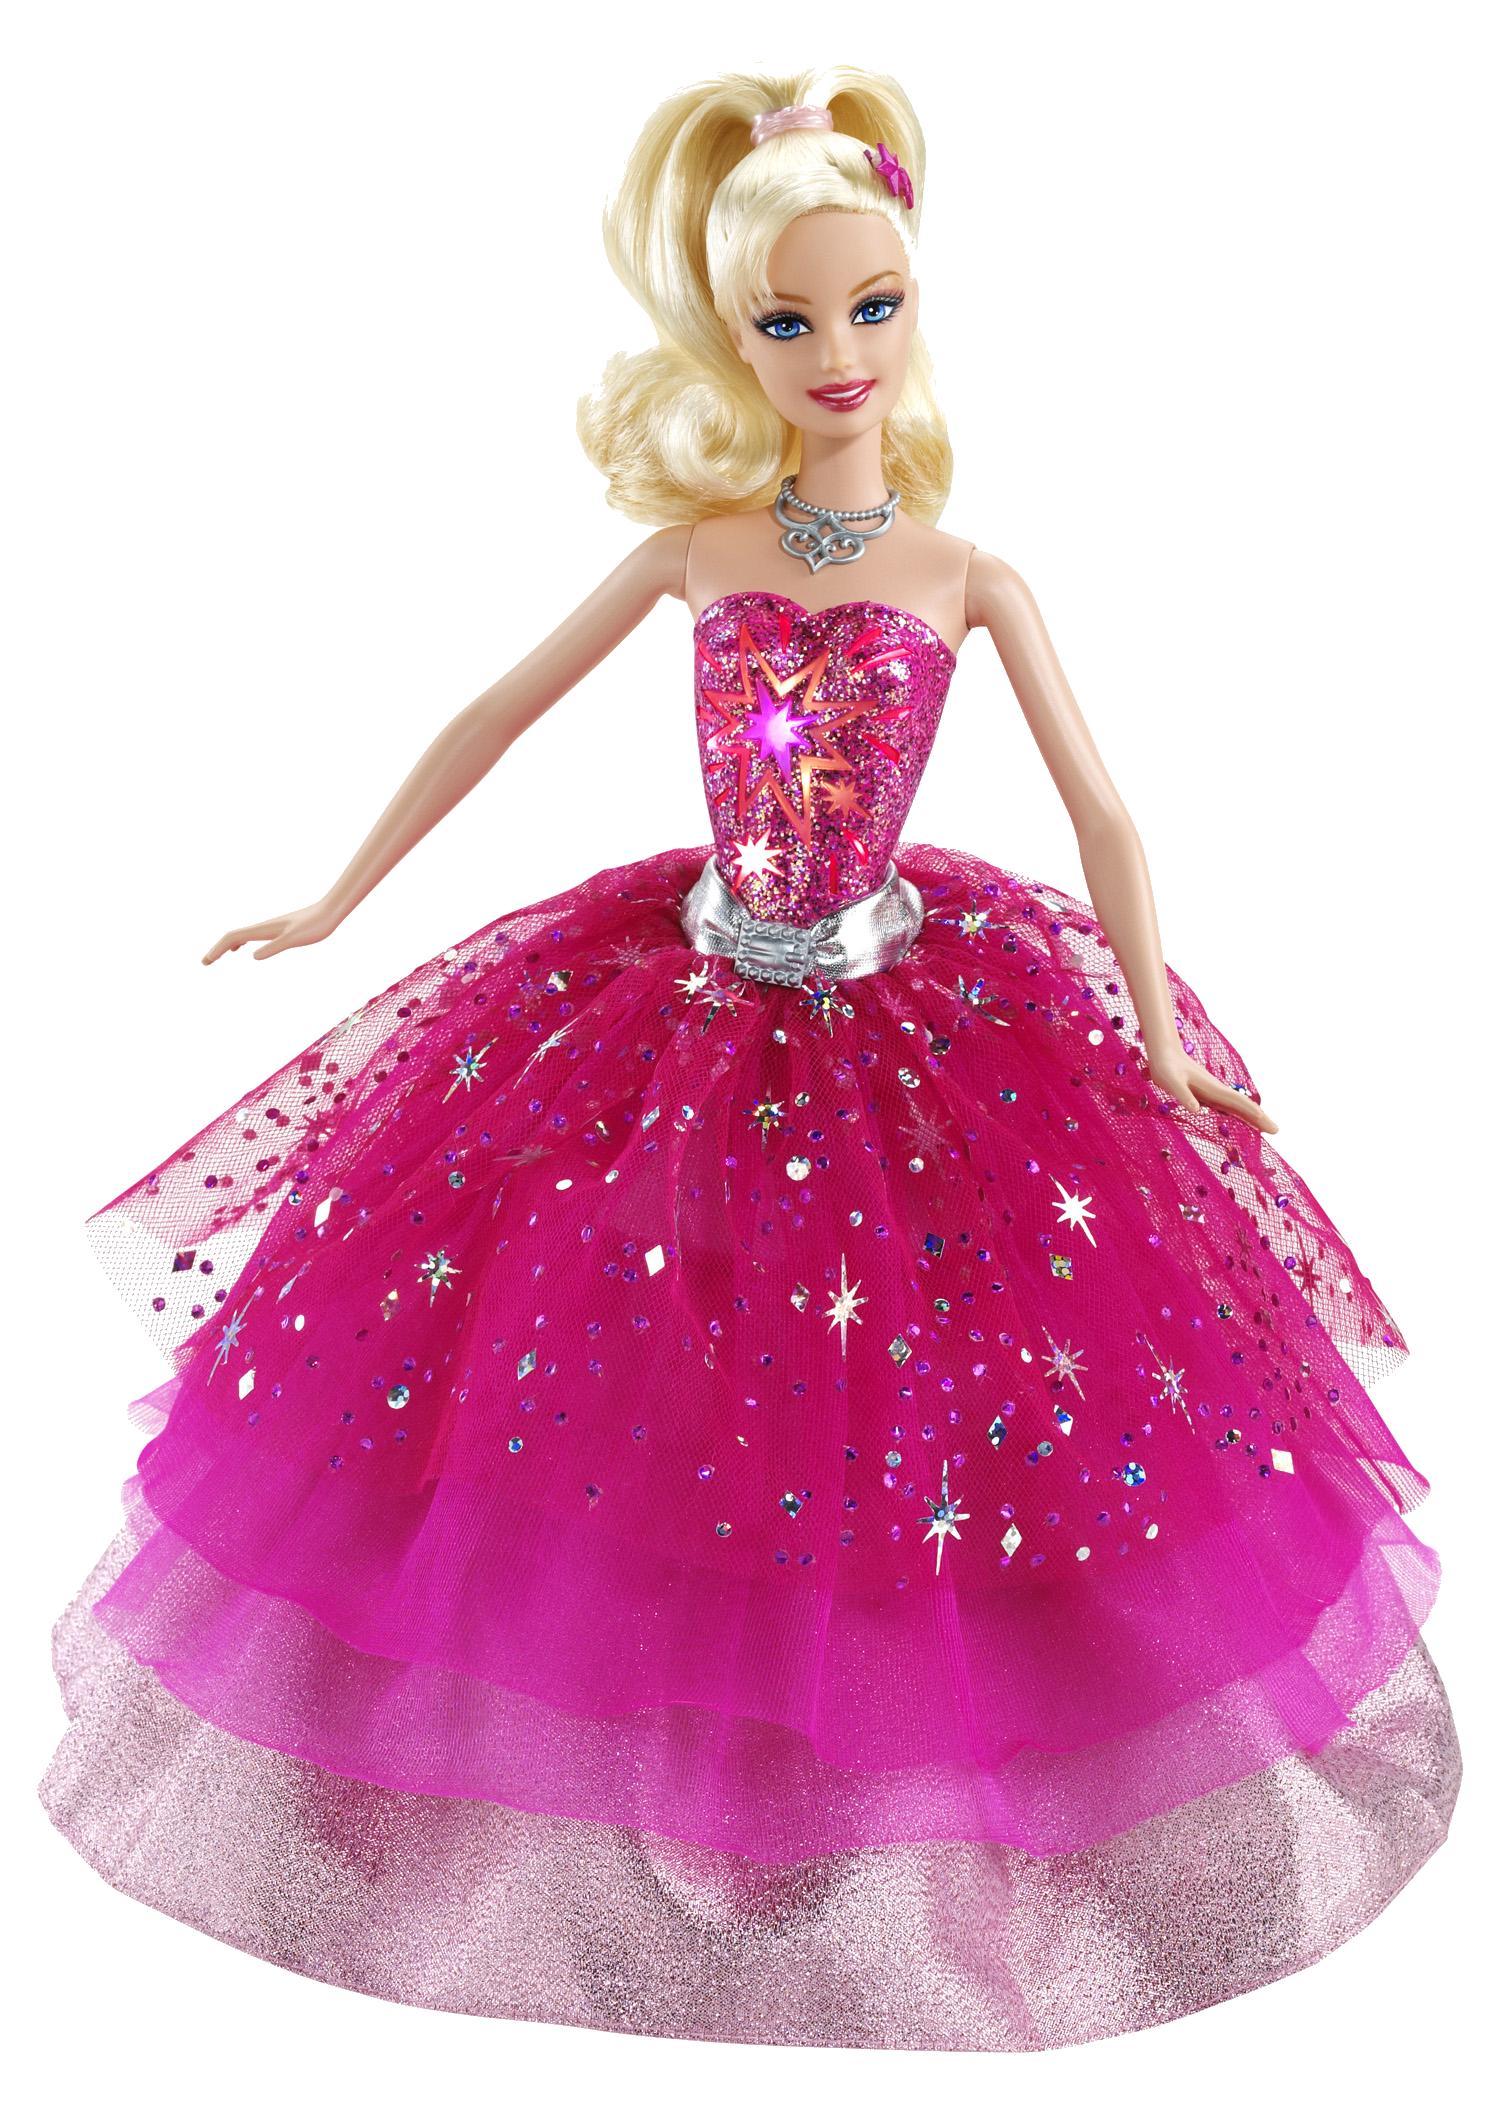 Barbie Doll Png Image Barbie Toys Barbie Fashion Barbie Dress